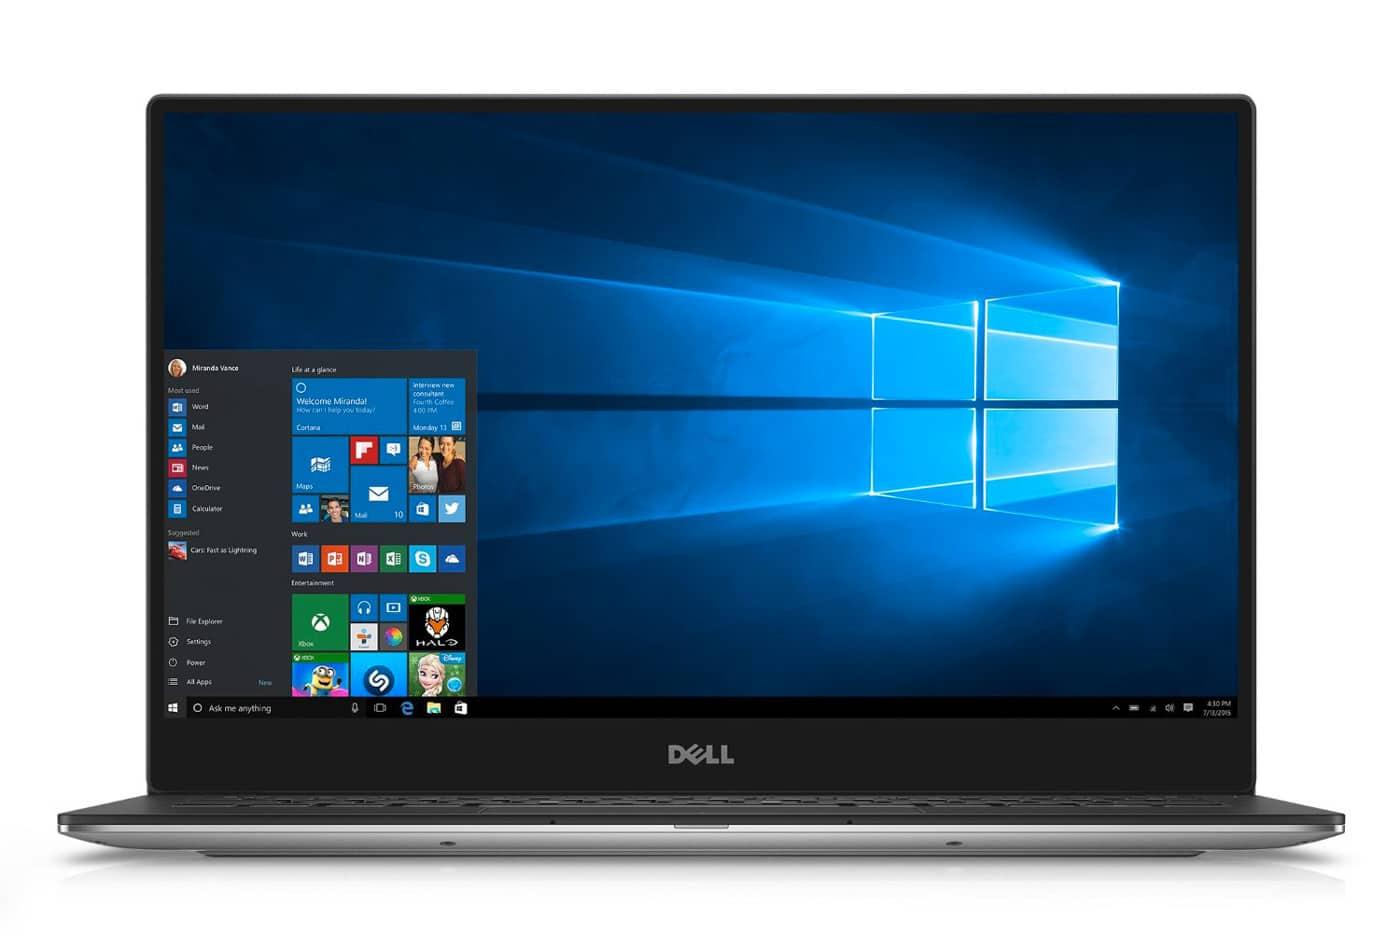 "Dell XPS 13 9360 (60W93), ultrabook 13"" QHD+ SSD512 i7 Kaby Lake 16Go à 1580€"